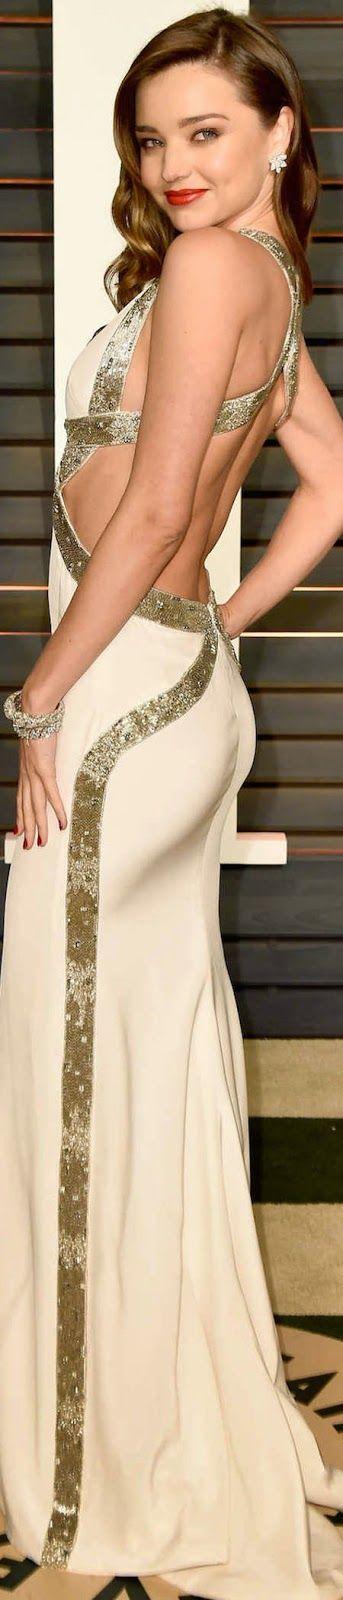 Miranda Kerr 2015 Vanity Fair Oscar Party